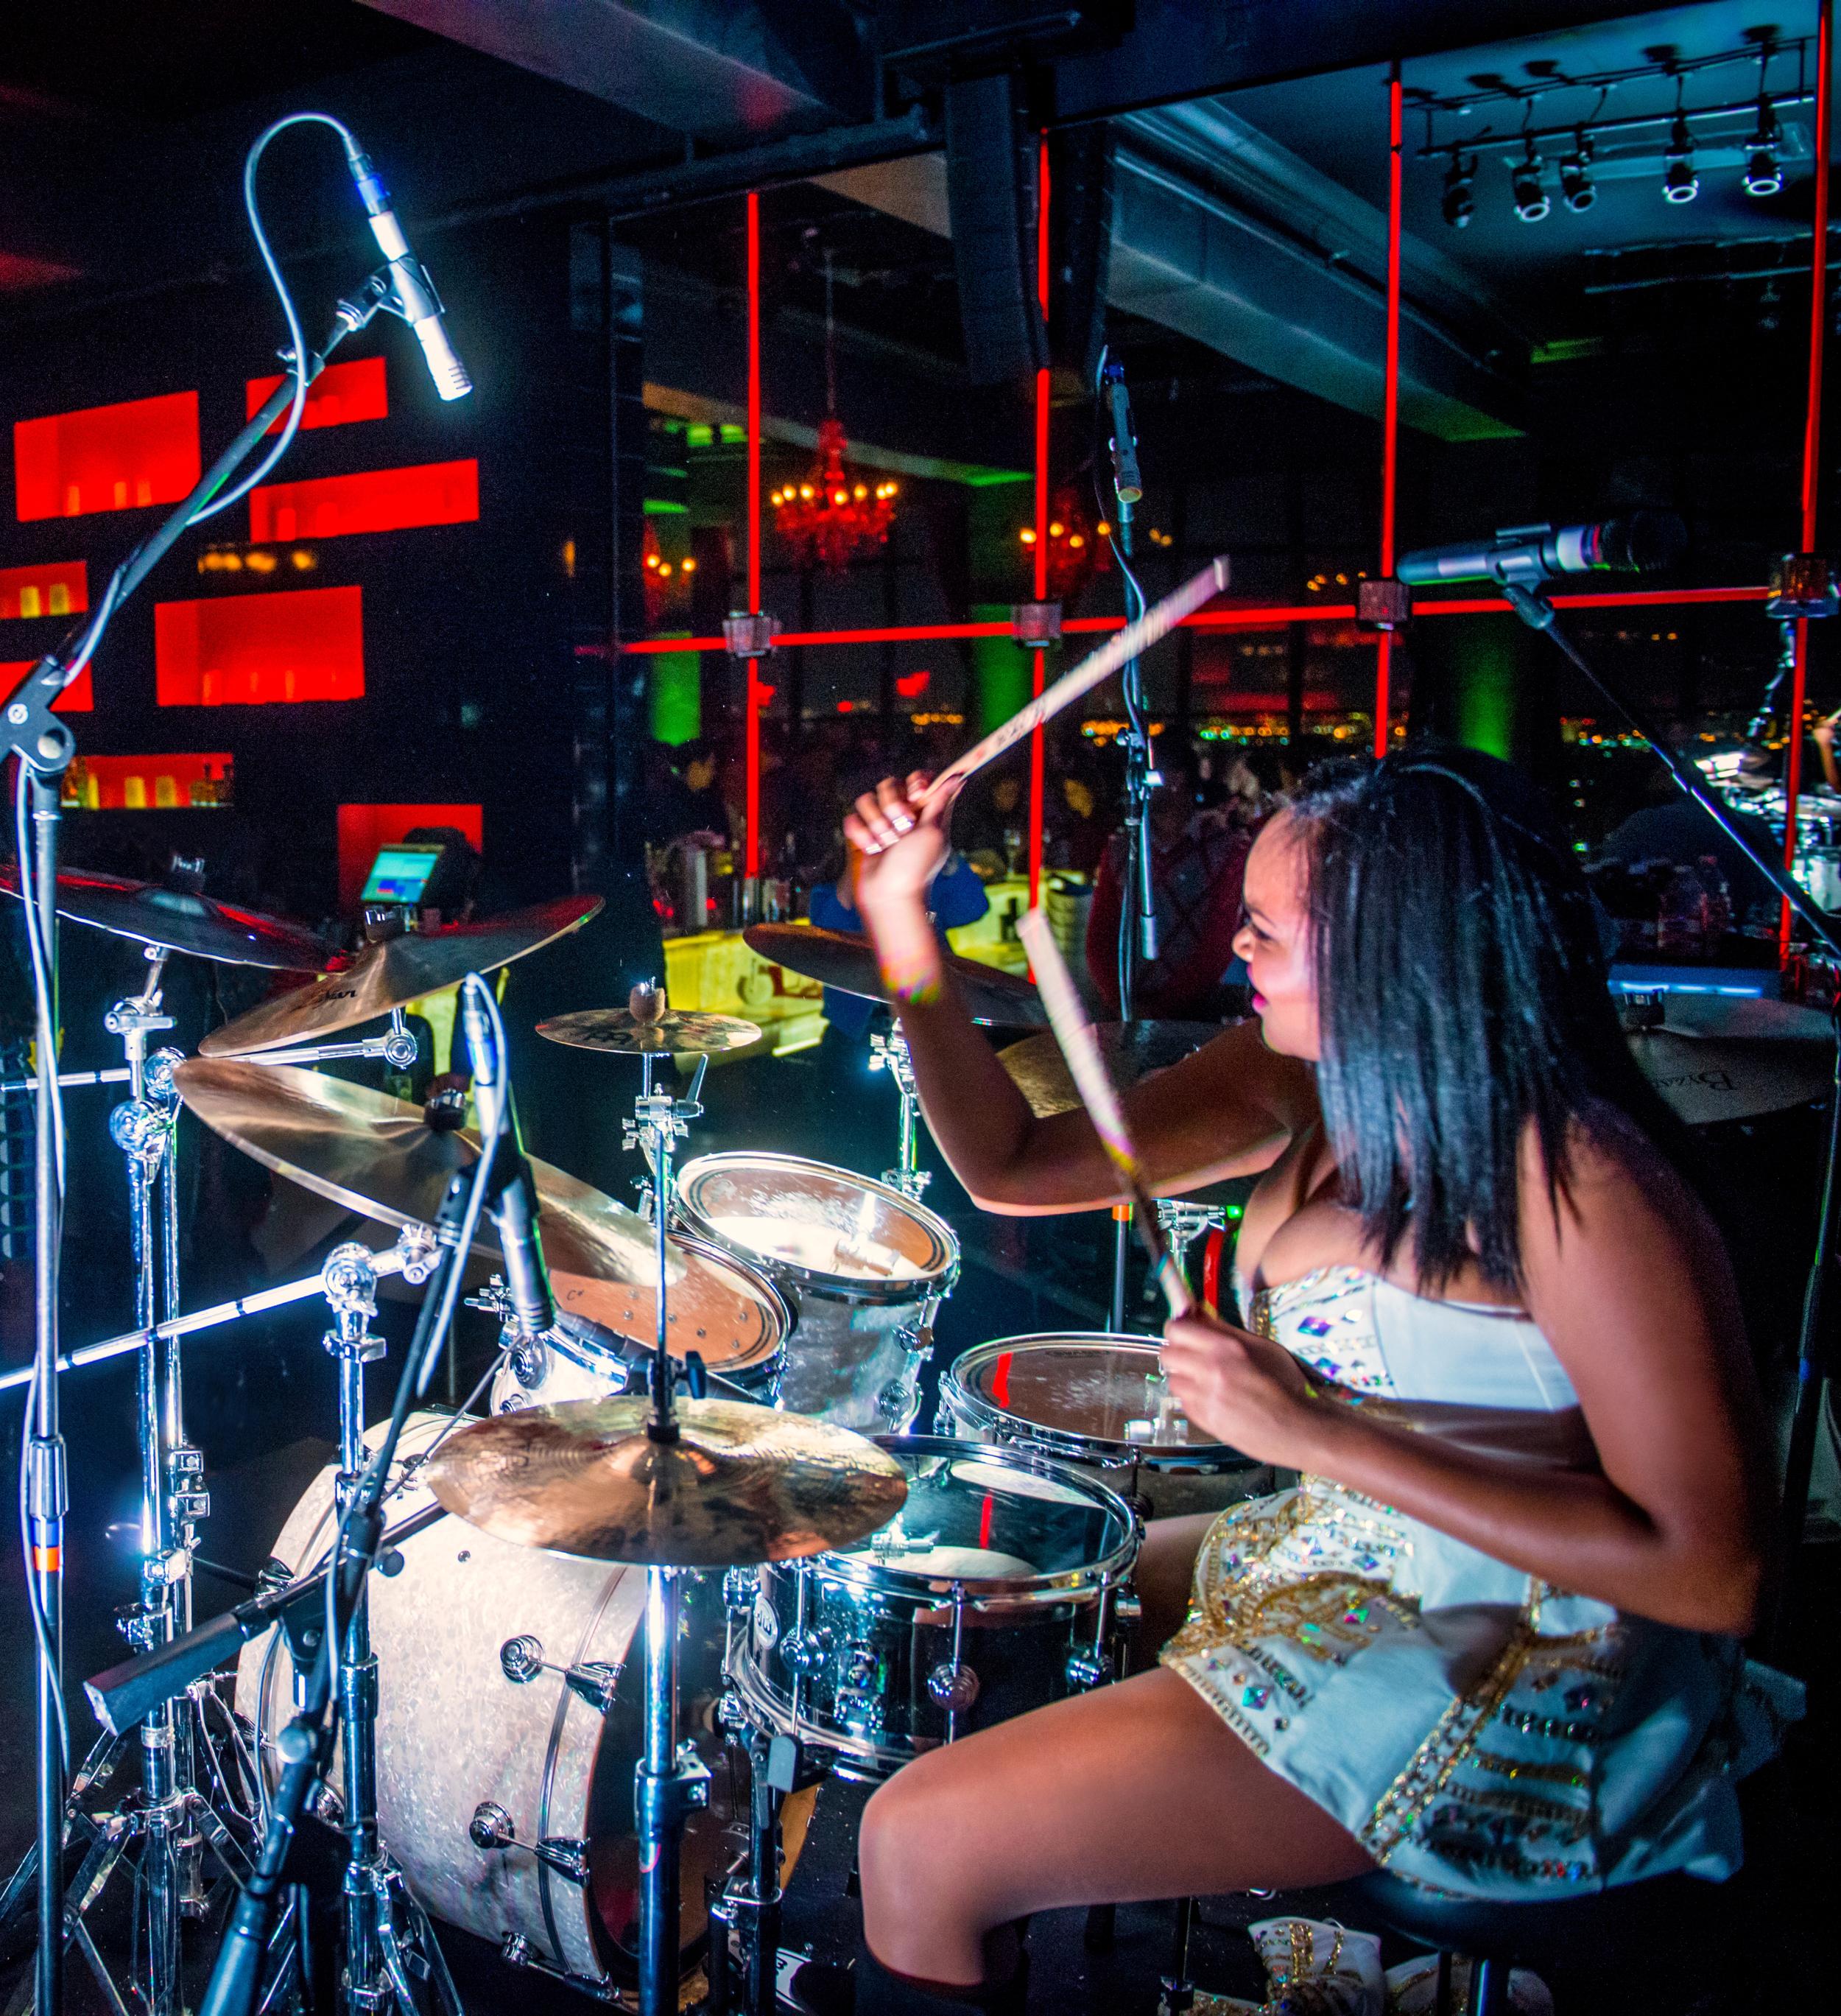 Glorious, Livetronica Drummer, Pop-R&B Singer, Producer, Live at W Washington, POV 7.jpg